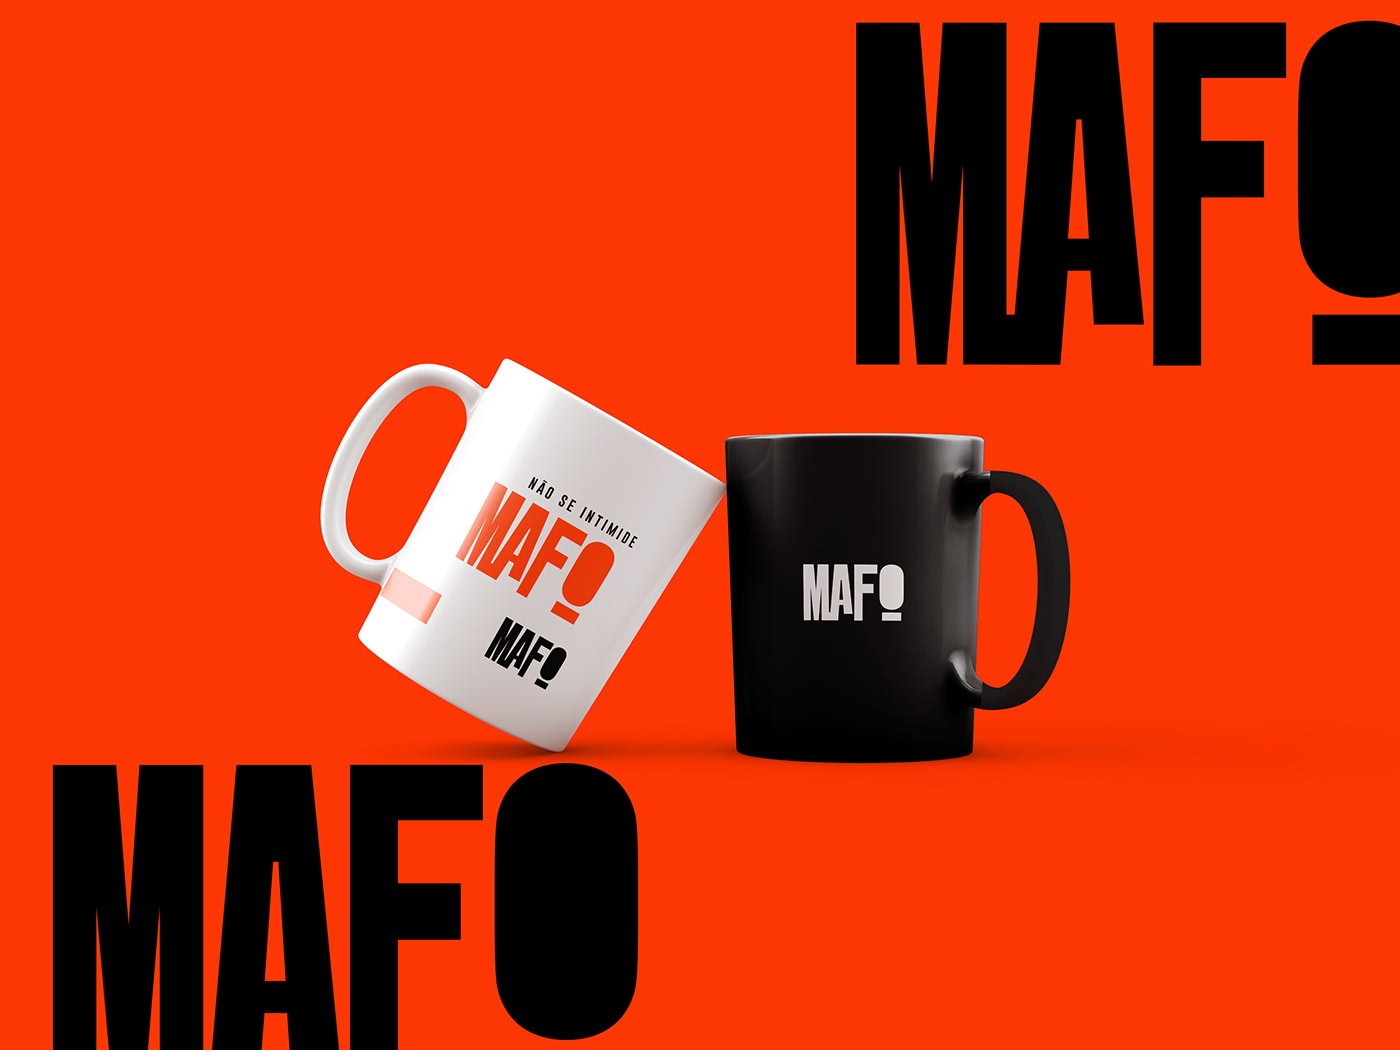 africa Brasil empoderamento empreendedorismo preto identidade visual ioruba logo logomark MAFO preto